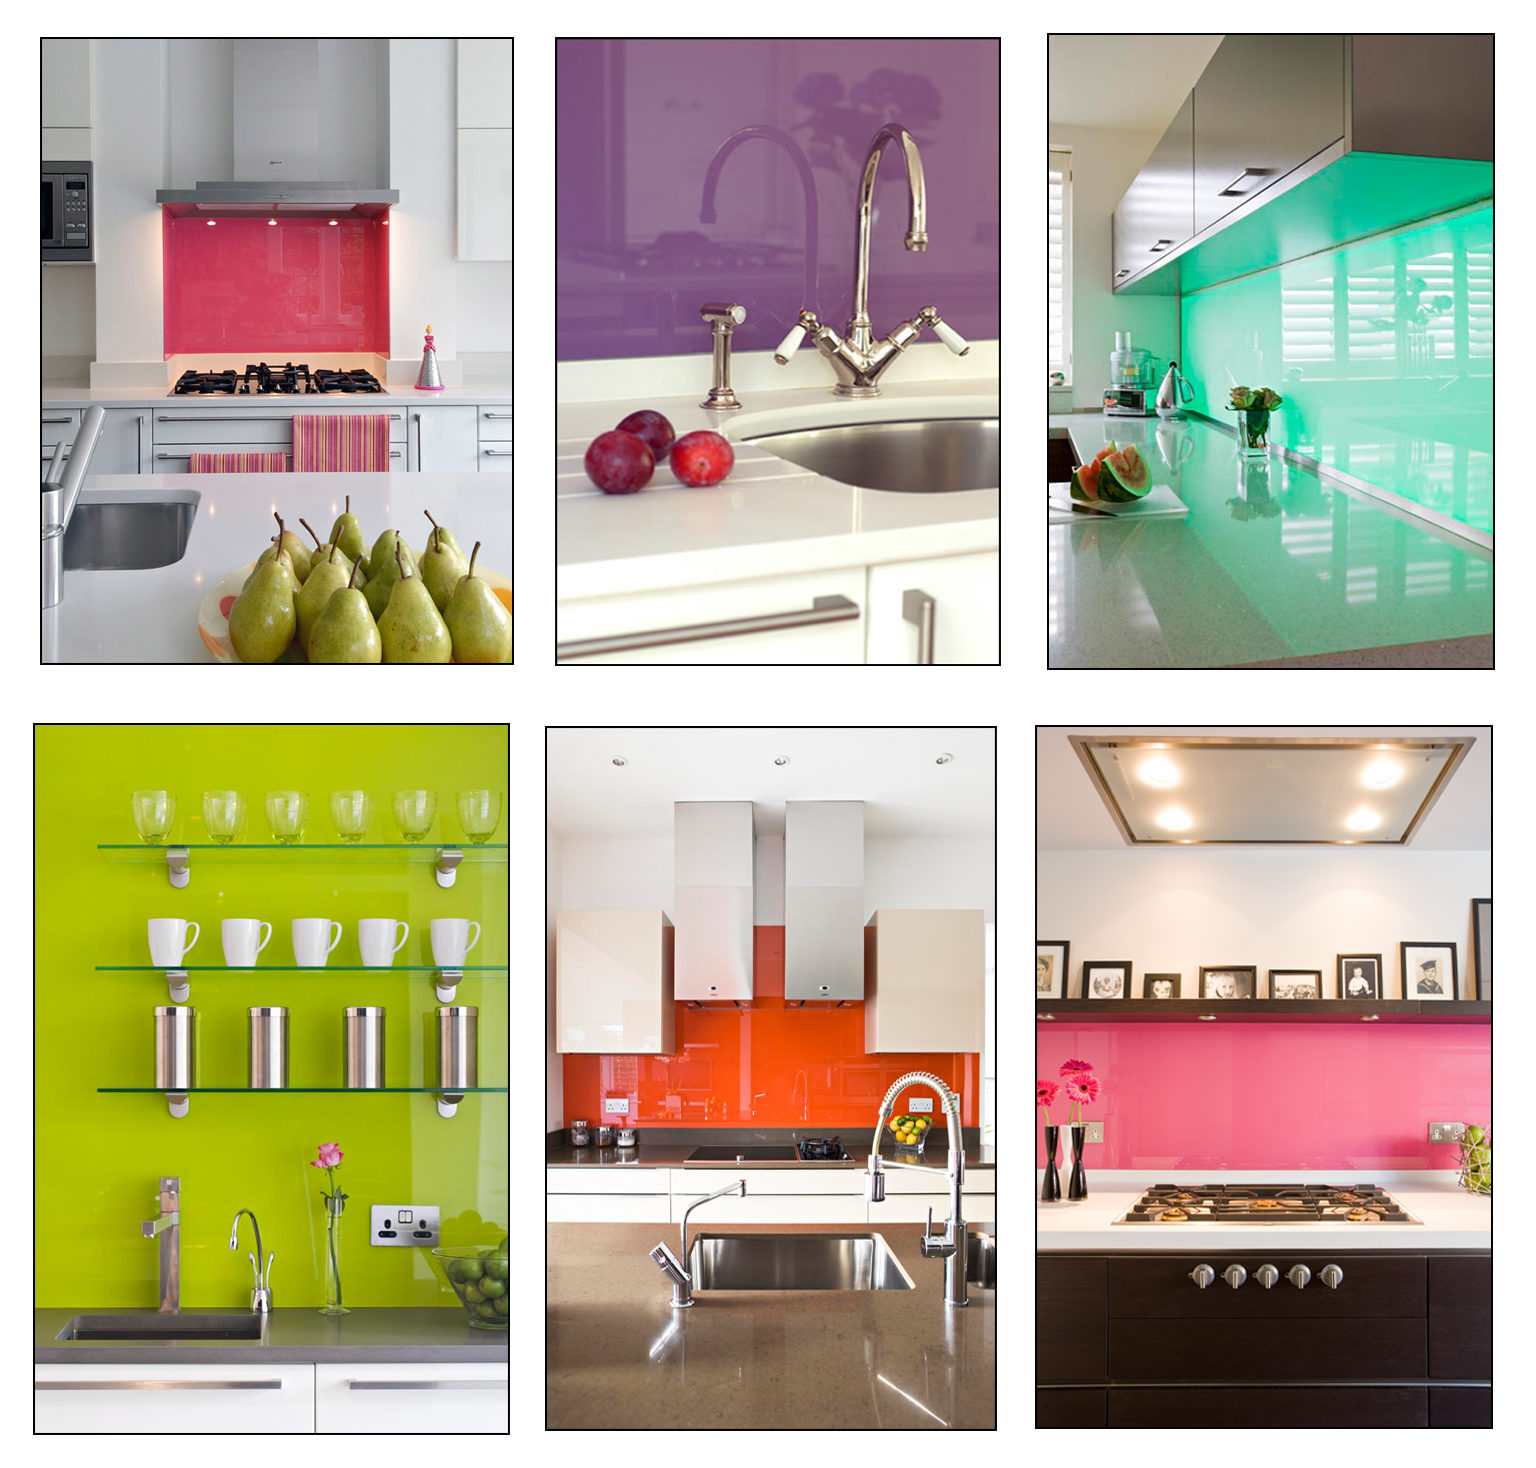 New Modern Kitchens At Neil Lerner: This Week We're Hot On...Zingy Splashbacks!